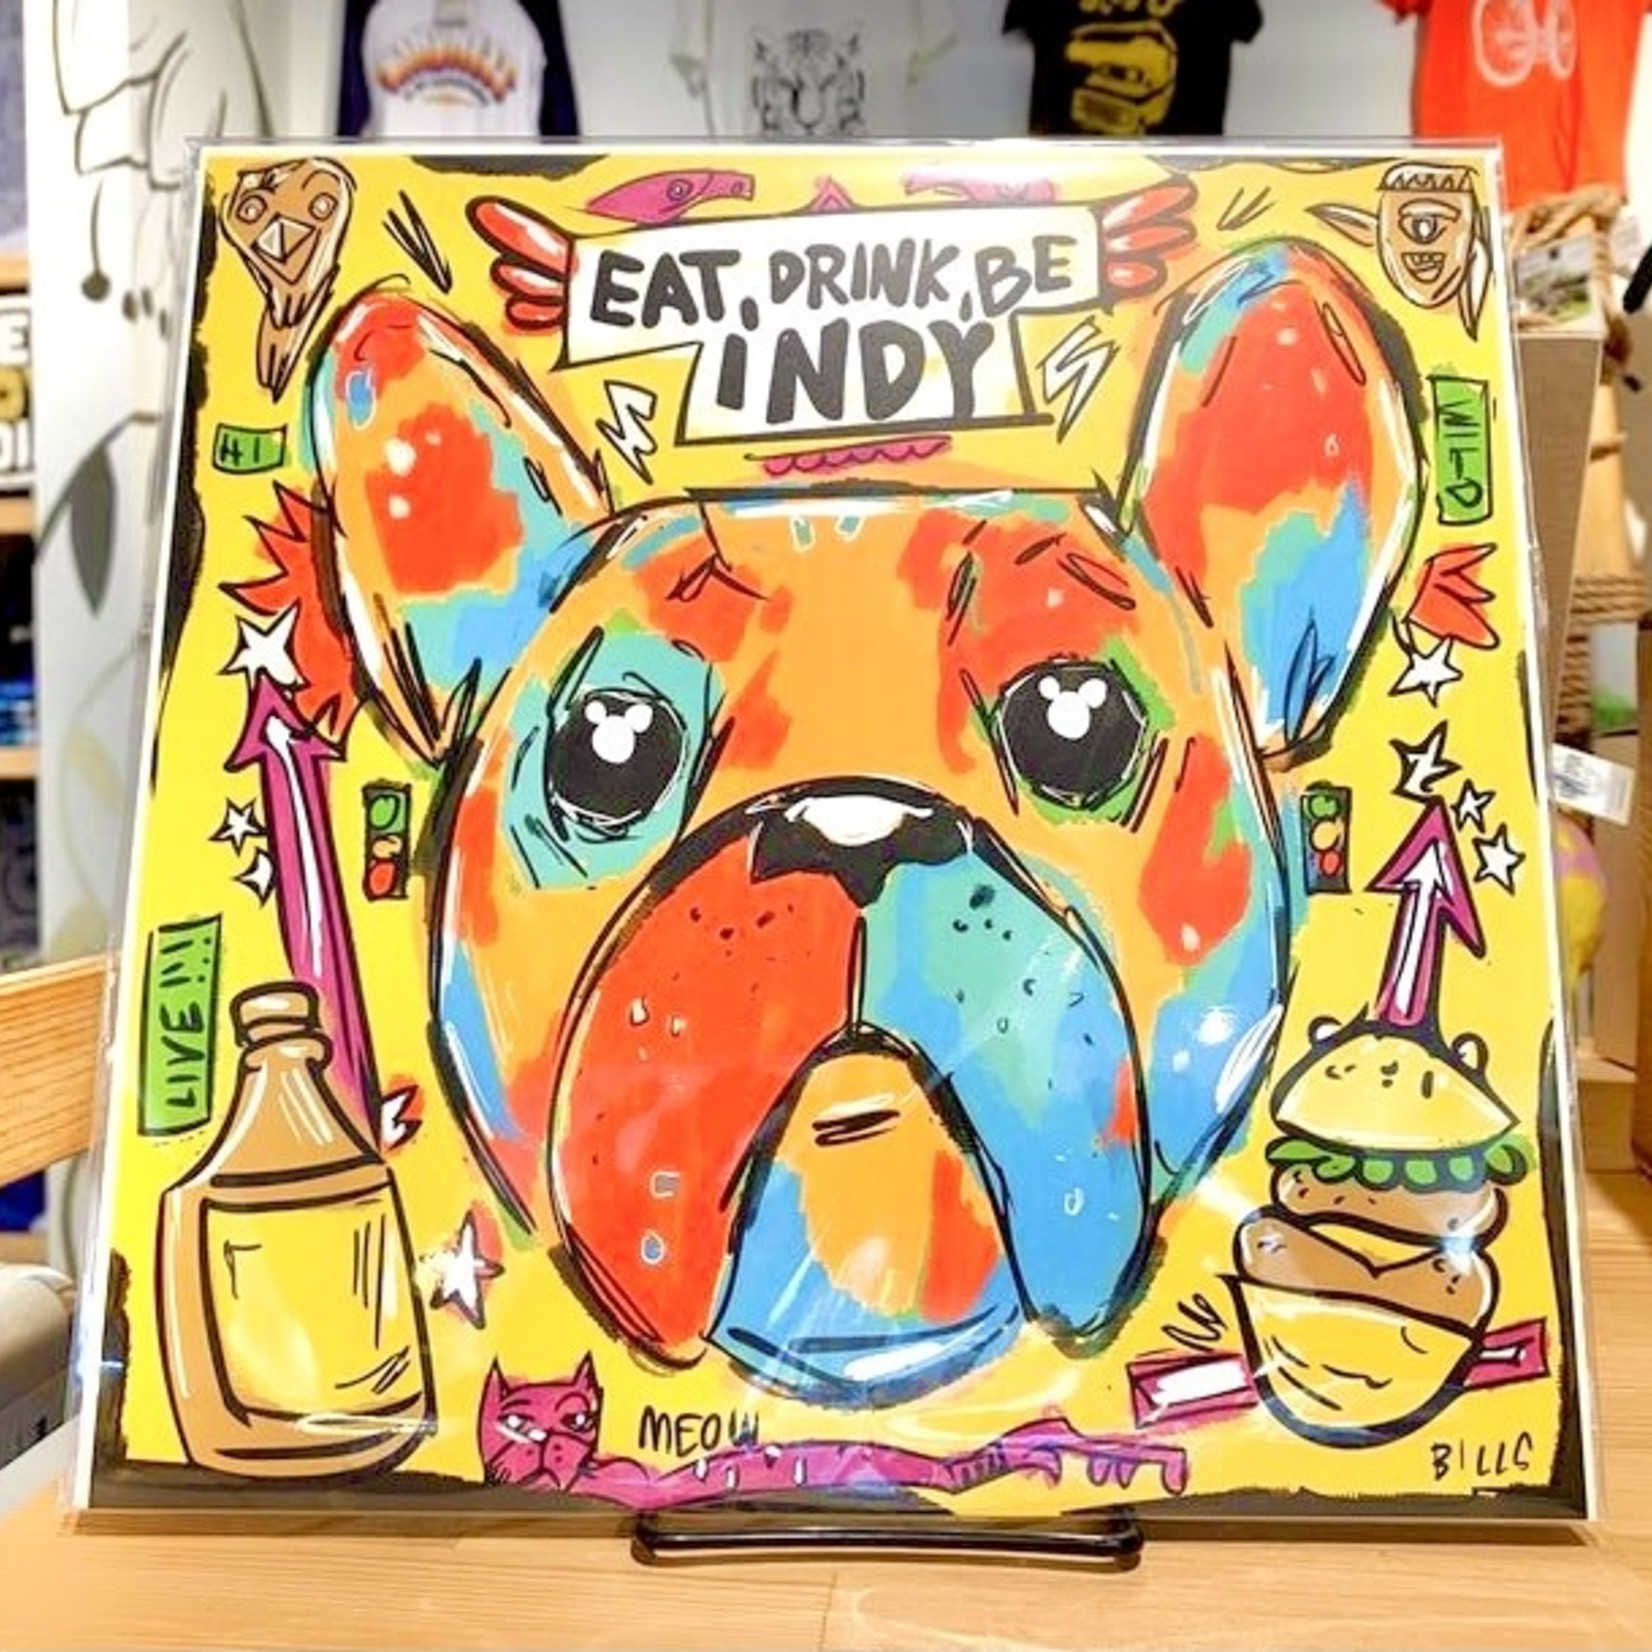 Eat, Drink, Be Indy French Bulldog 11x11 Art Print